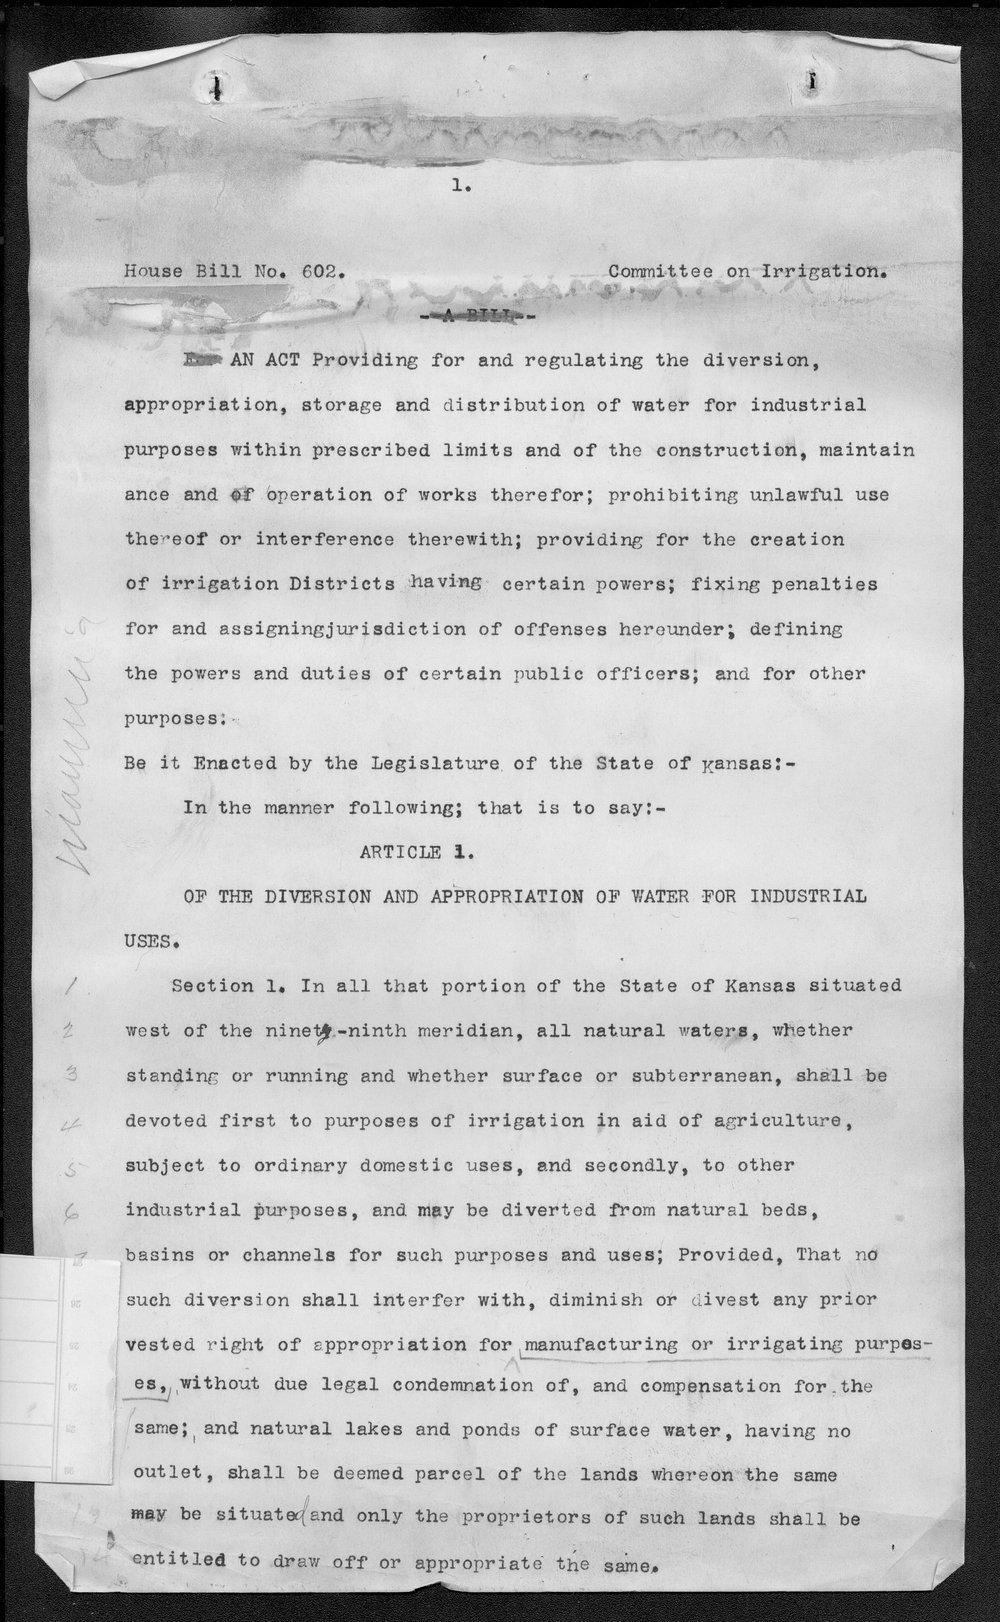 House Bill 602, Committee on Irrigation, Kansas Legislature - 1a